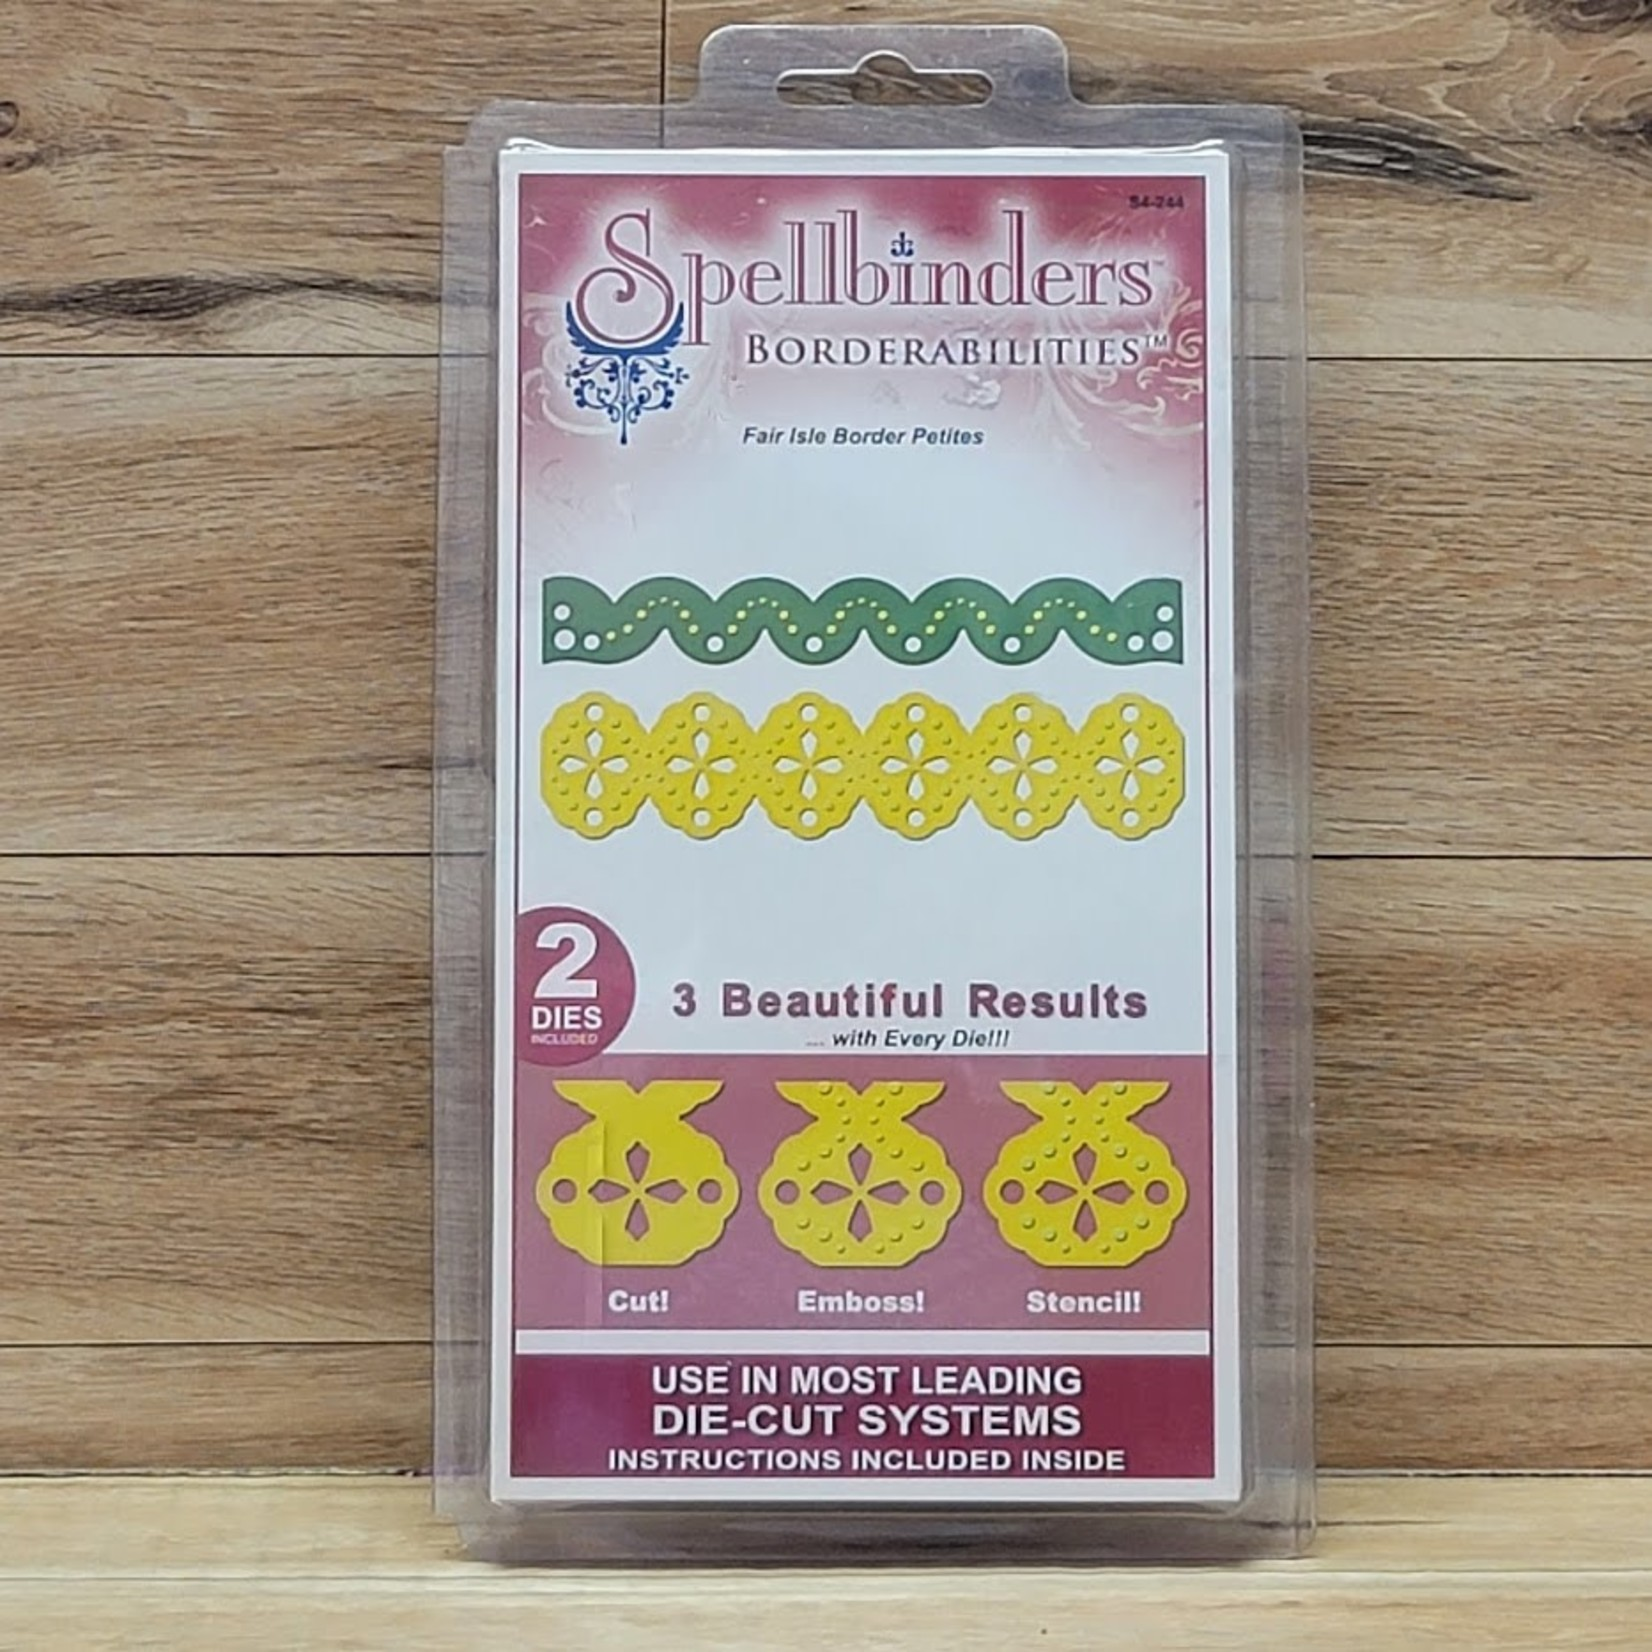 Spellbinders Spellbinders - Borderabilities - Fair Isle Border Petities